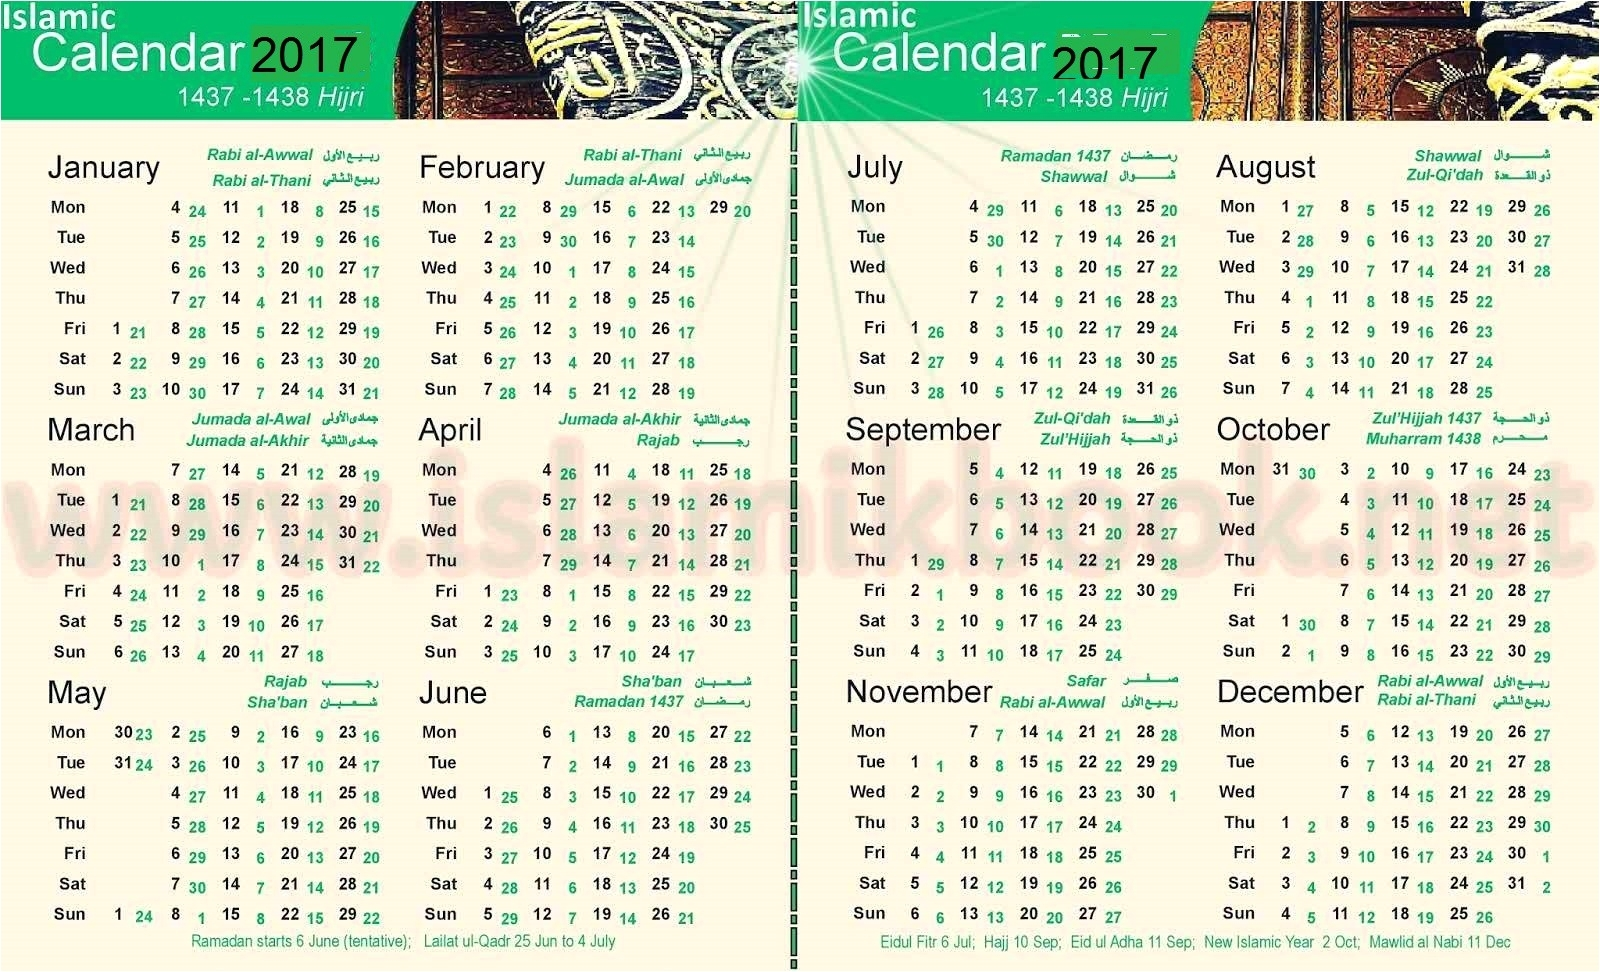 2016 Islamic Hijri Calendar Template Design Version 2. Hijri throughout Islamic Calander Template Lunar Cycle